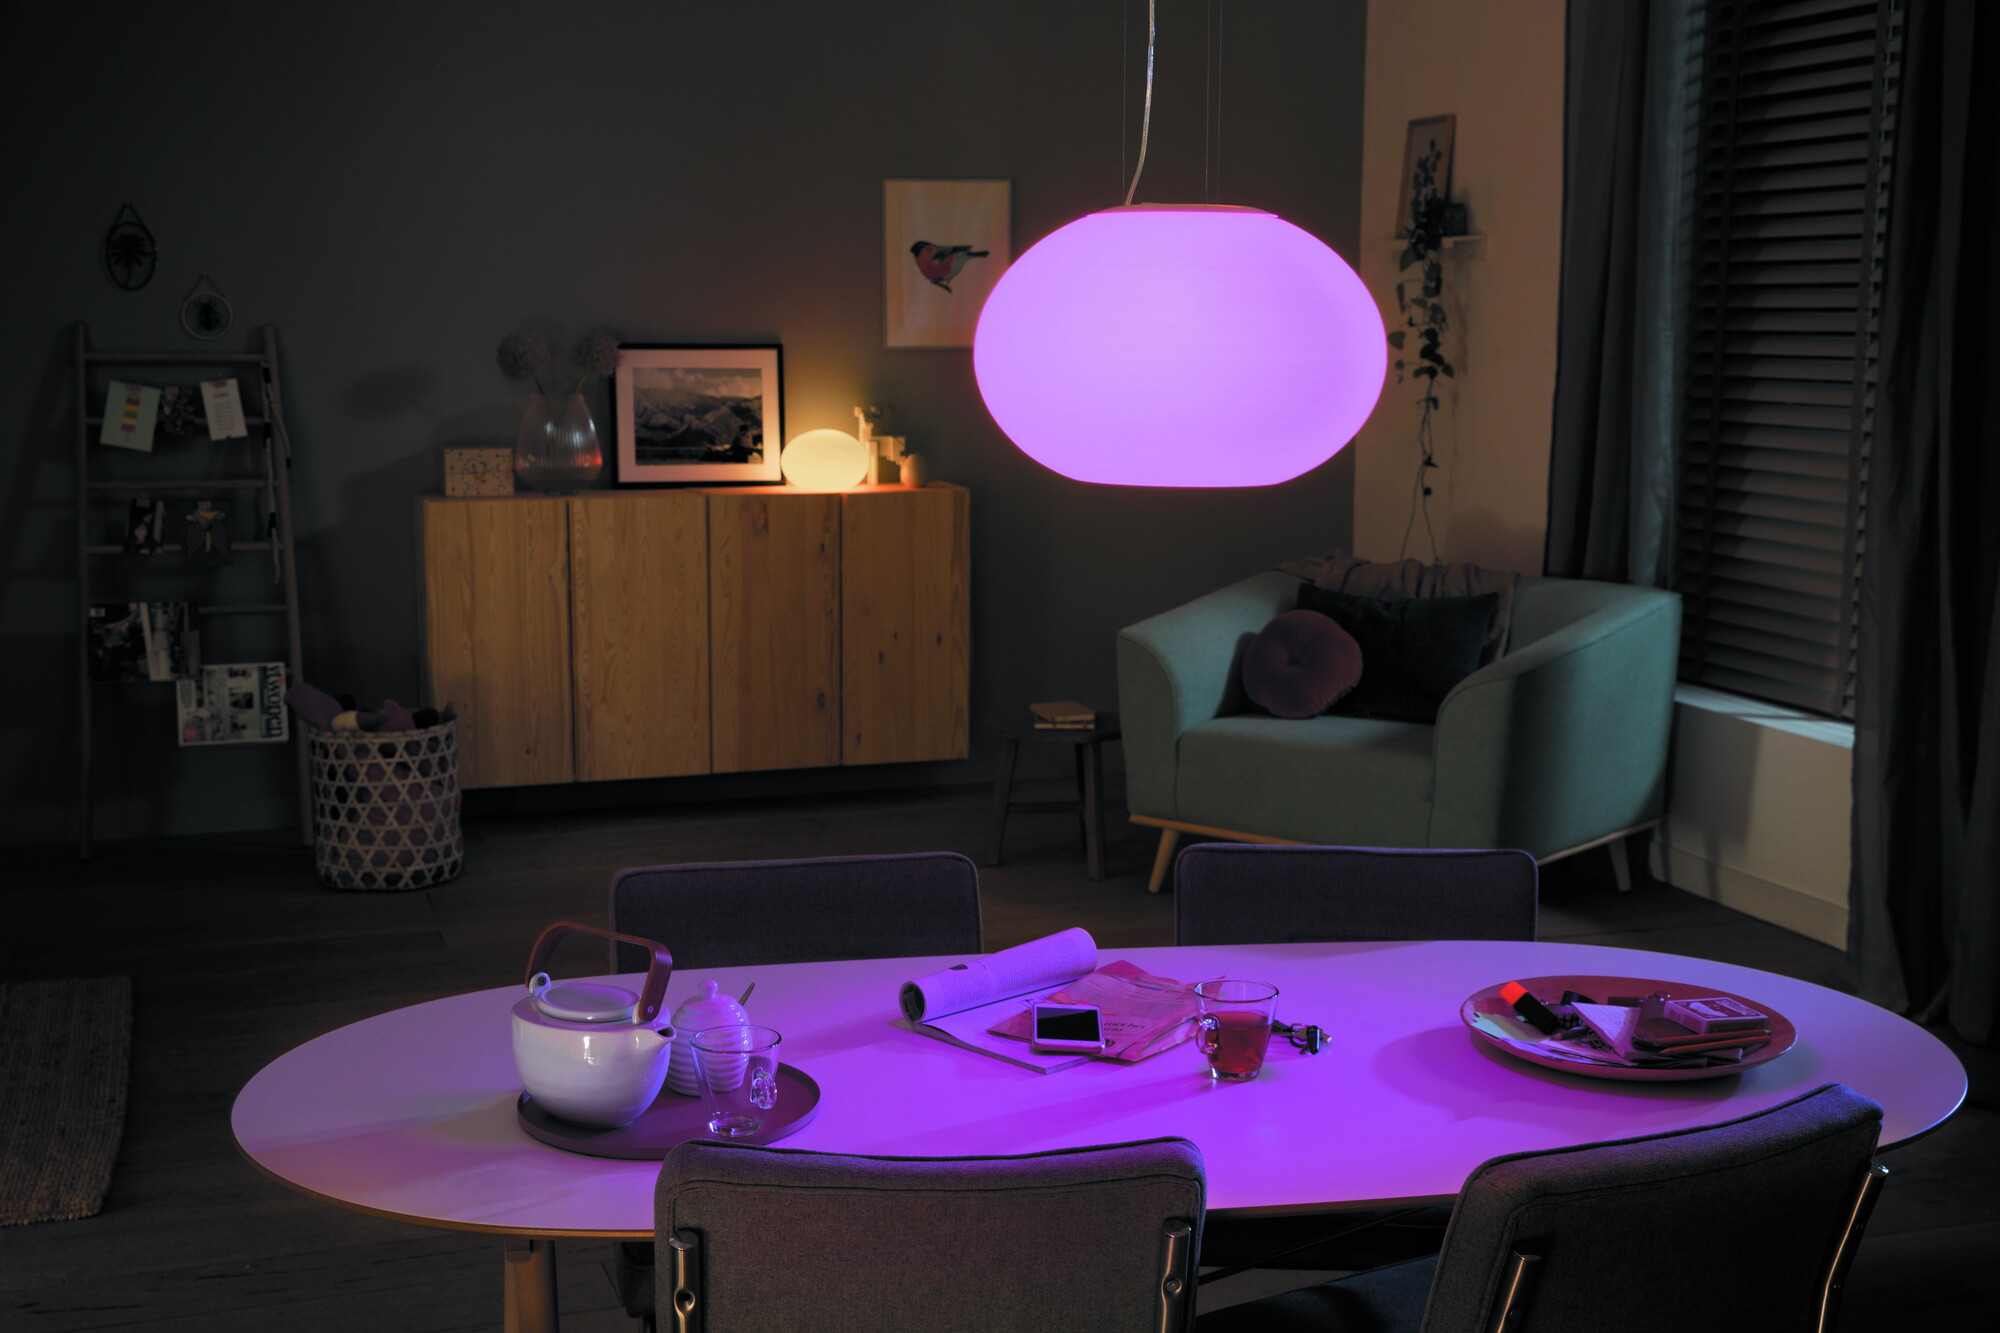 Philips HUE FLOURISH Hanglamp LED 1x31W/3000lm Wit